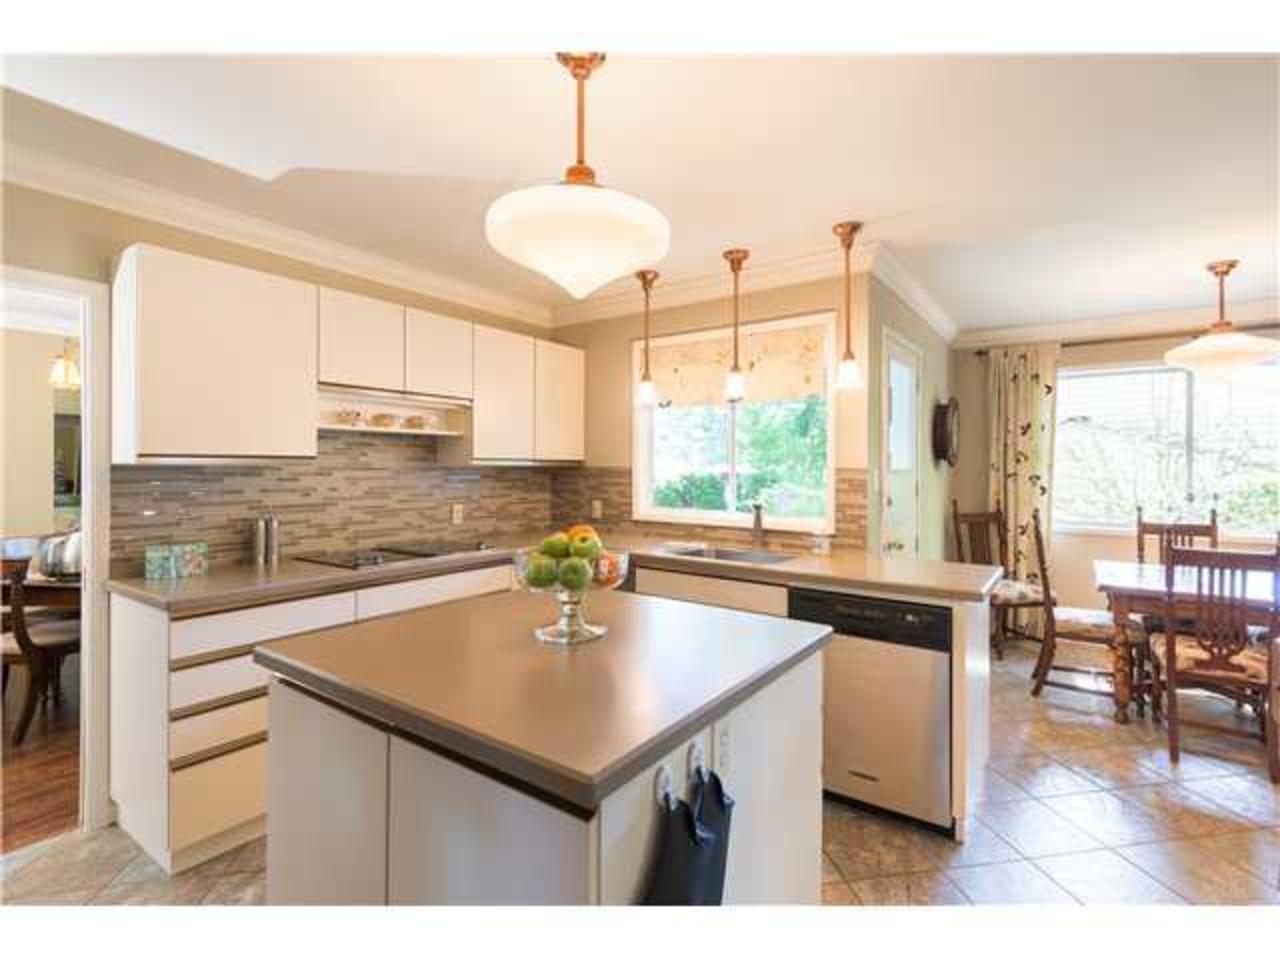 Kitchen at 5654 Westport Road, Eagle Harbour, West Vancouver